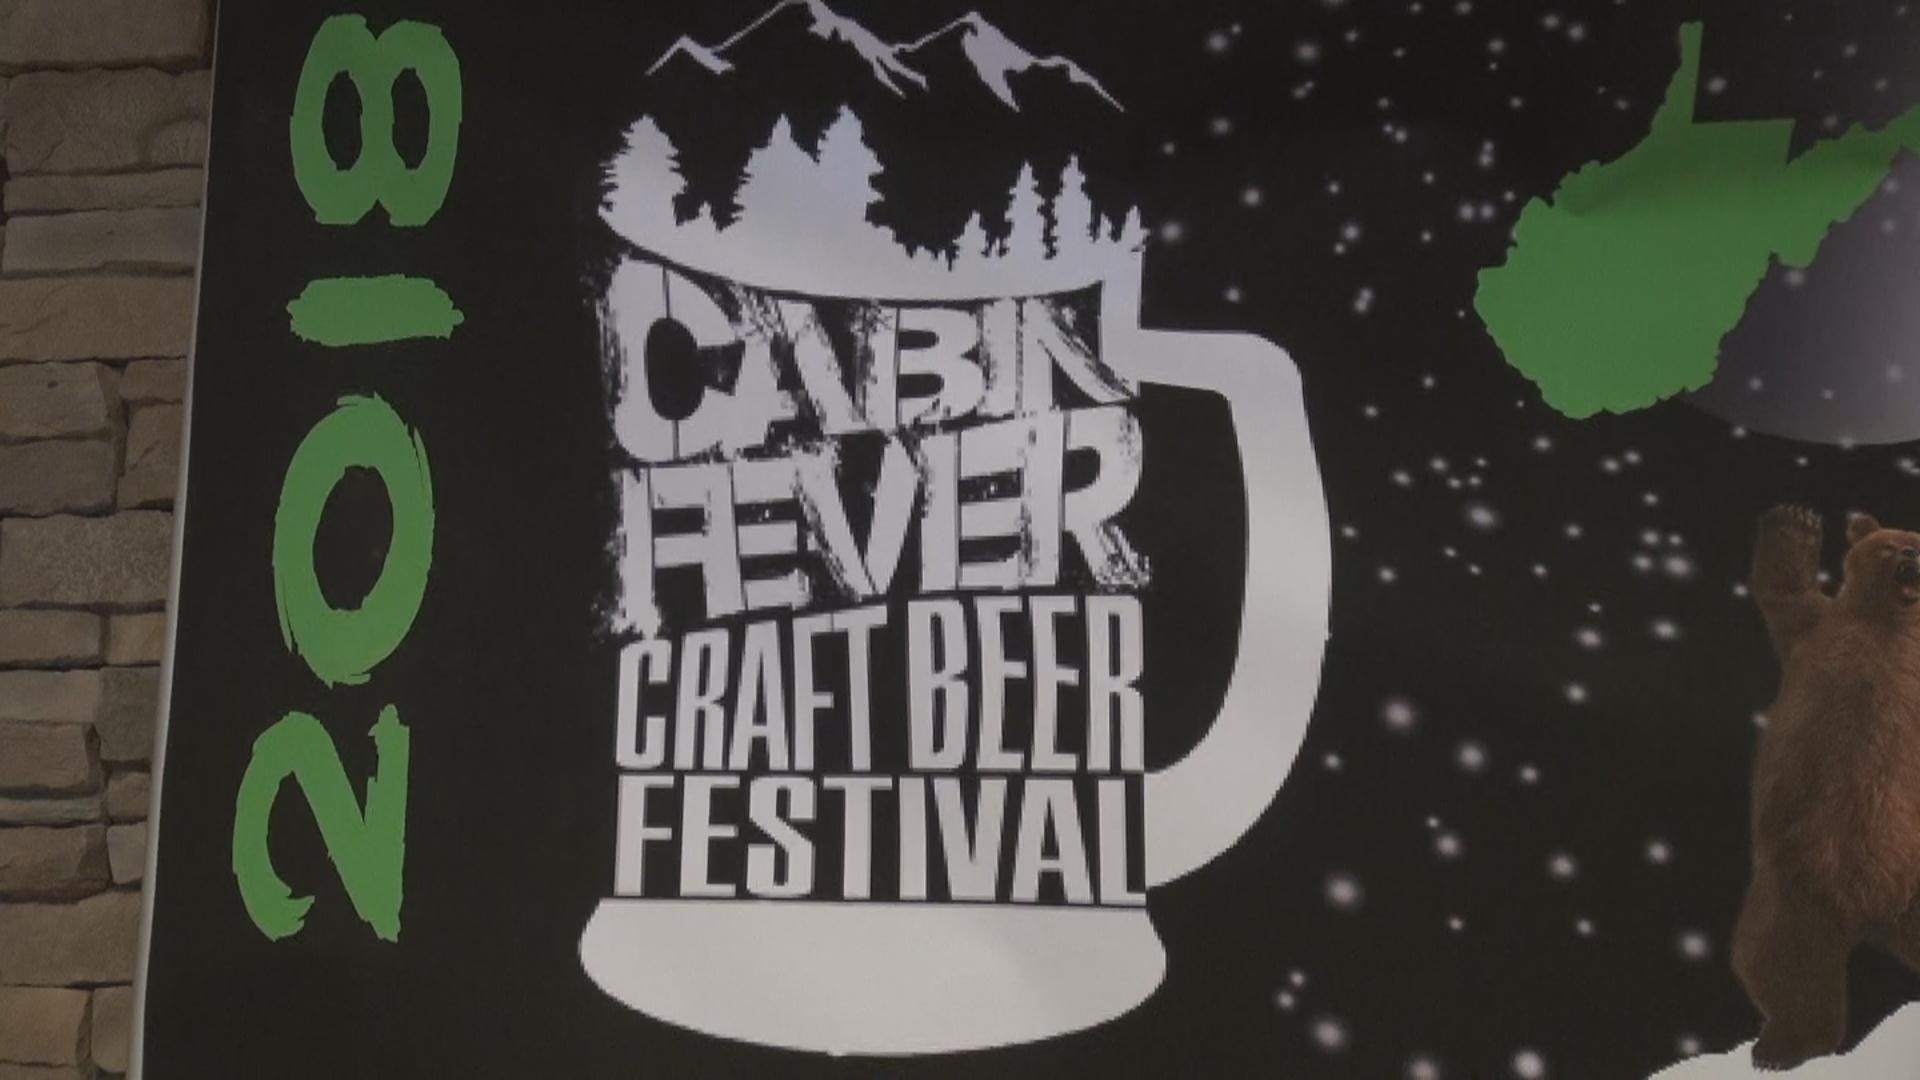 Cabin Fever Craft Beer Festival.jpg